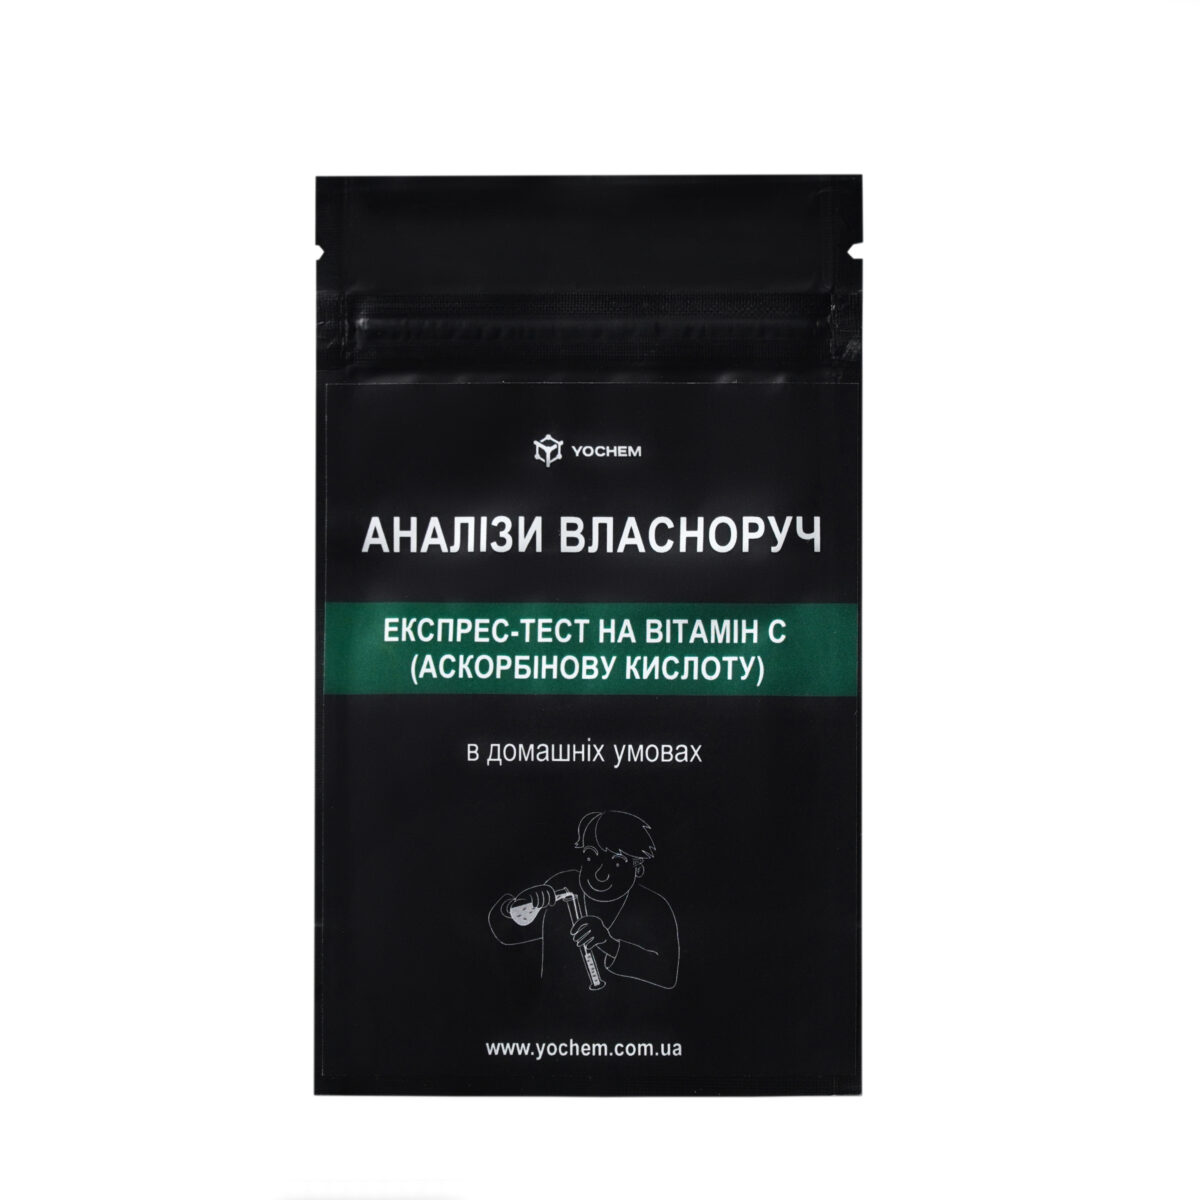 Экспресс-тест на витамин С (аскорбиновую кислоту) YOCHEM